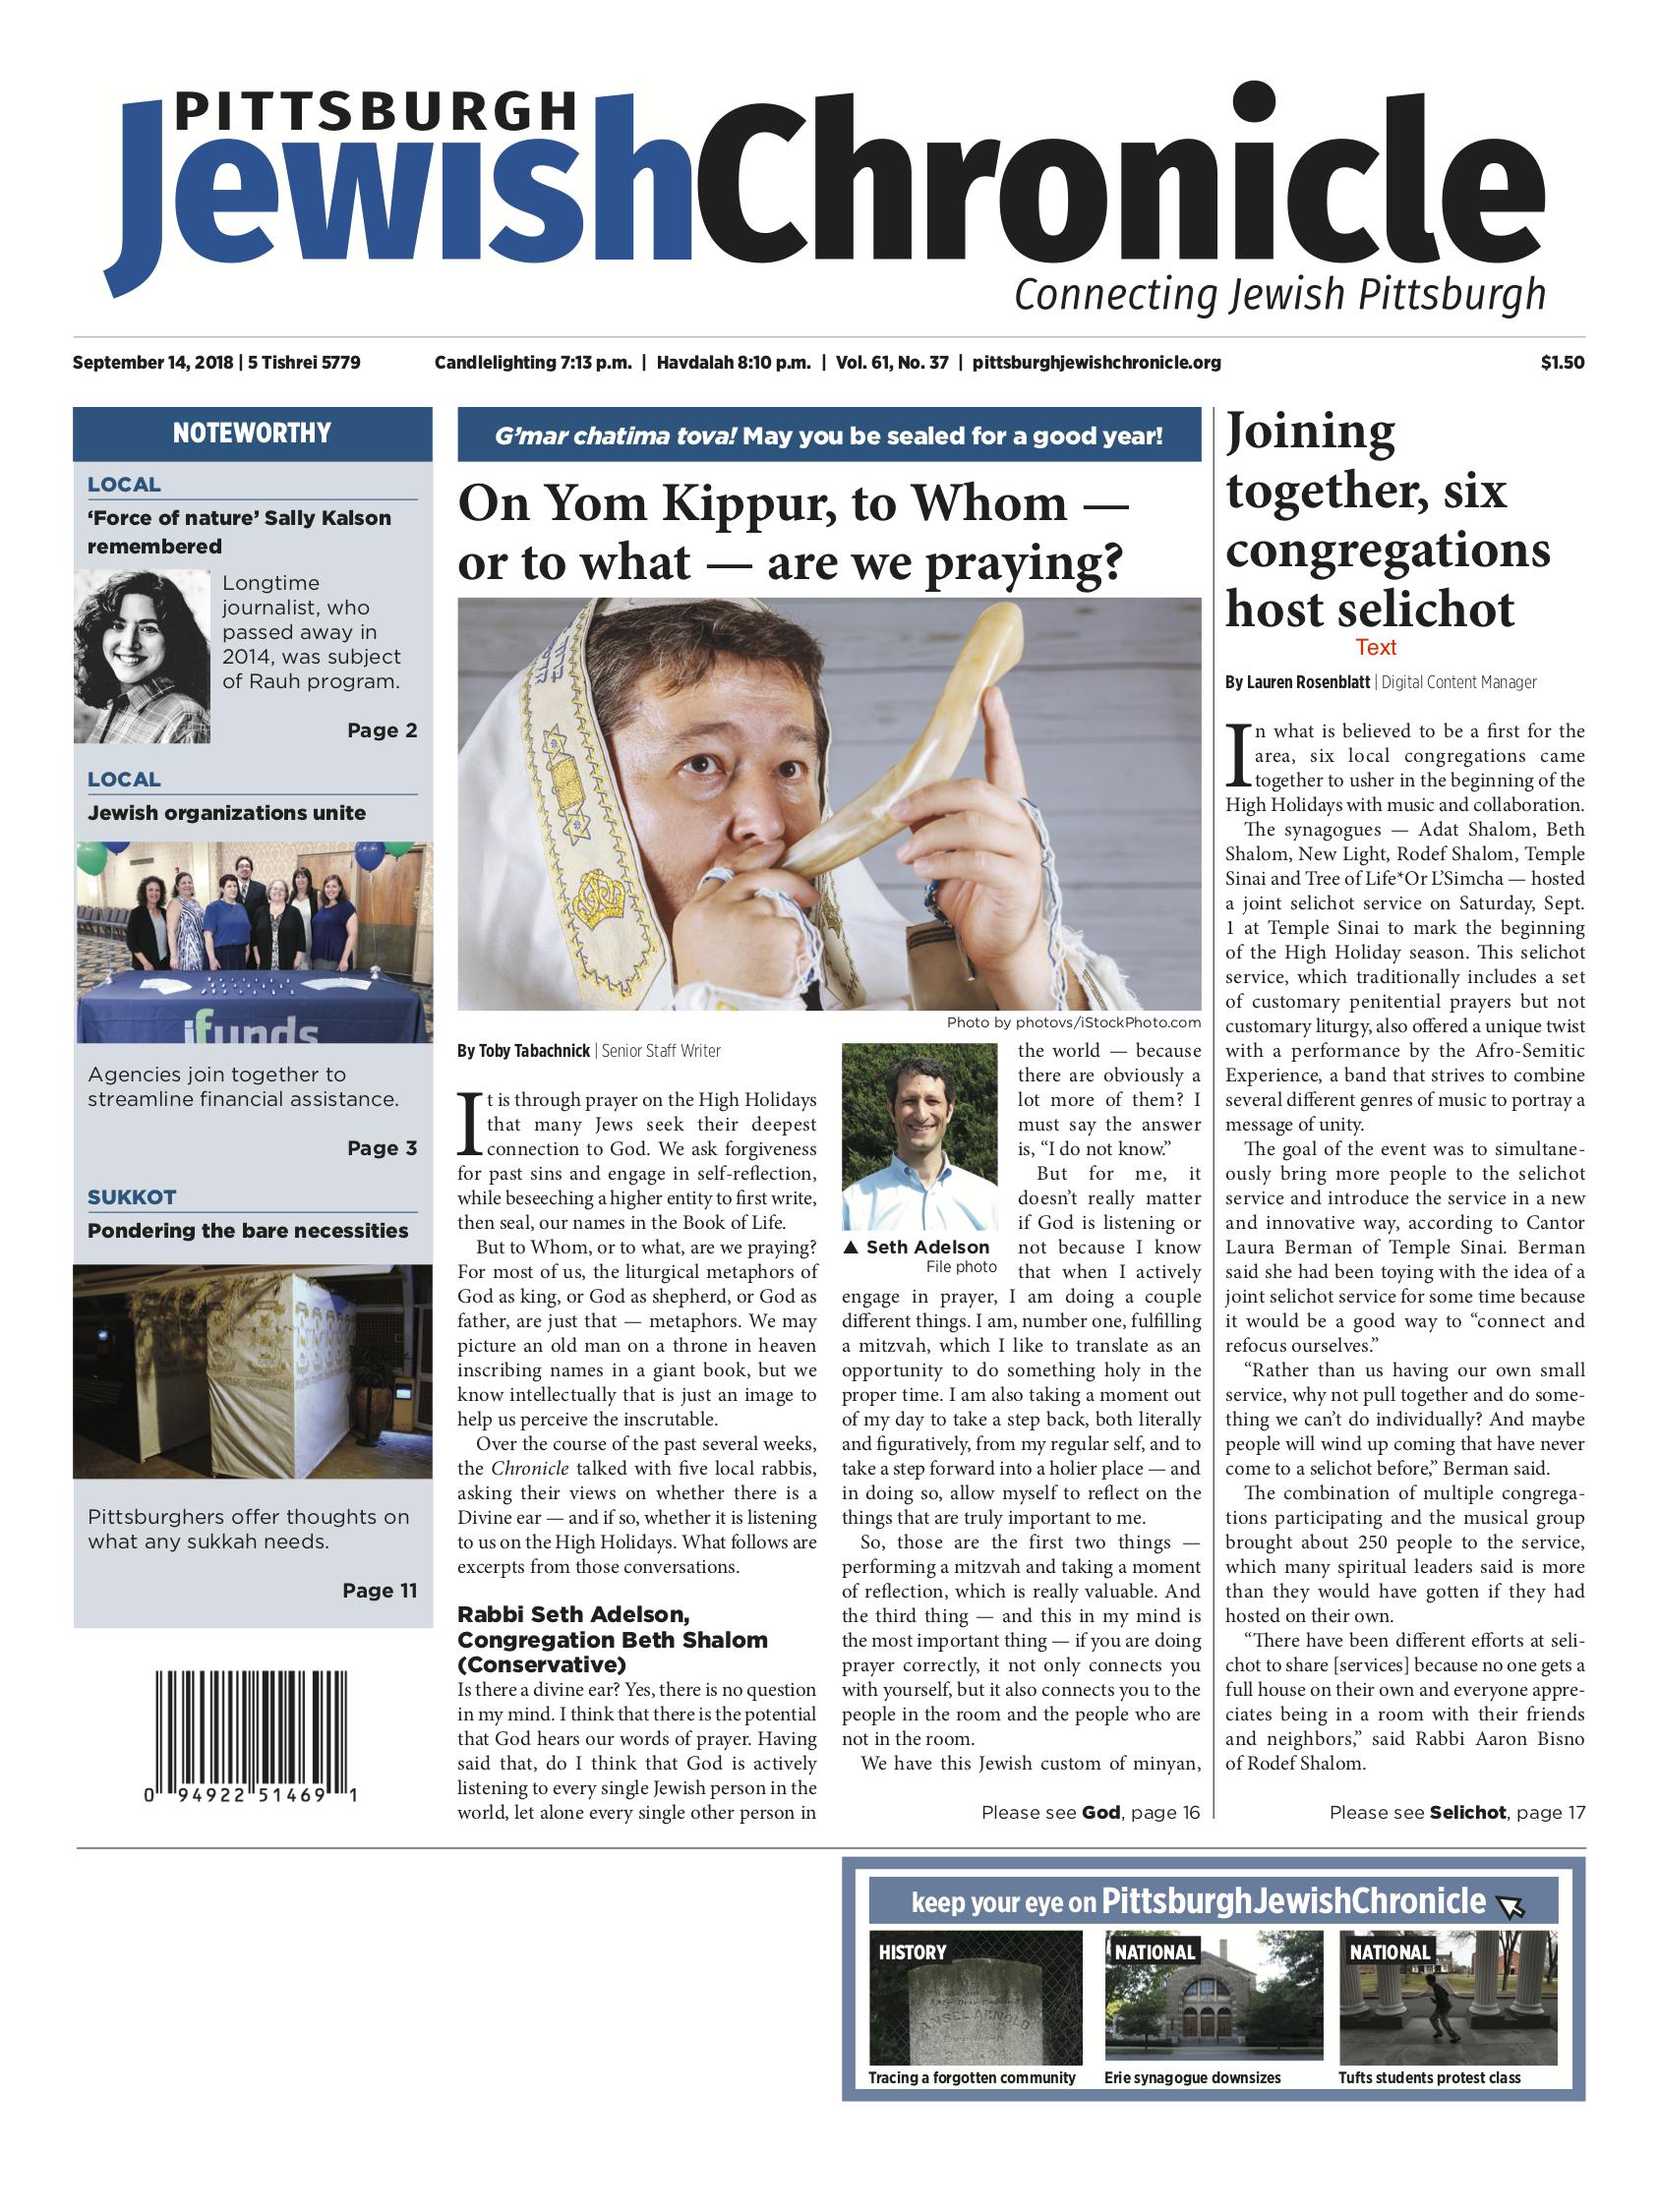 Pittsburgh Jewish Chronicle 9/14/2018